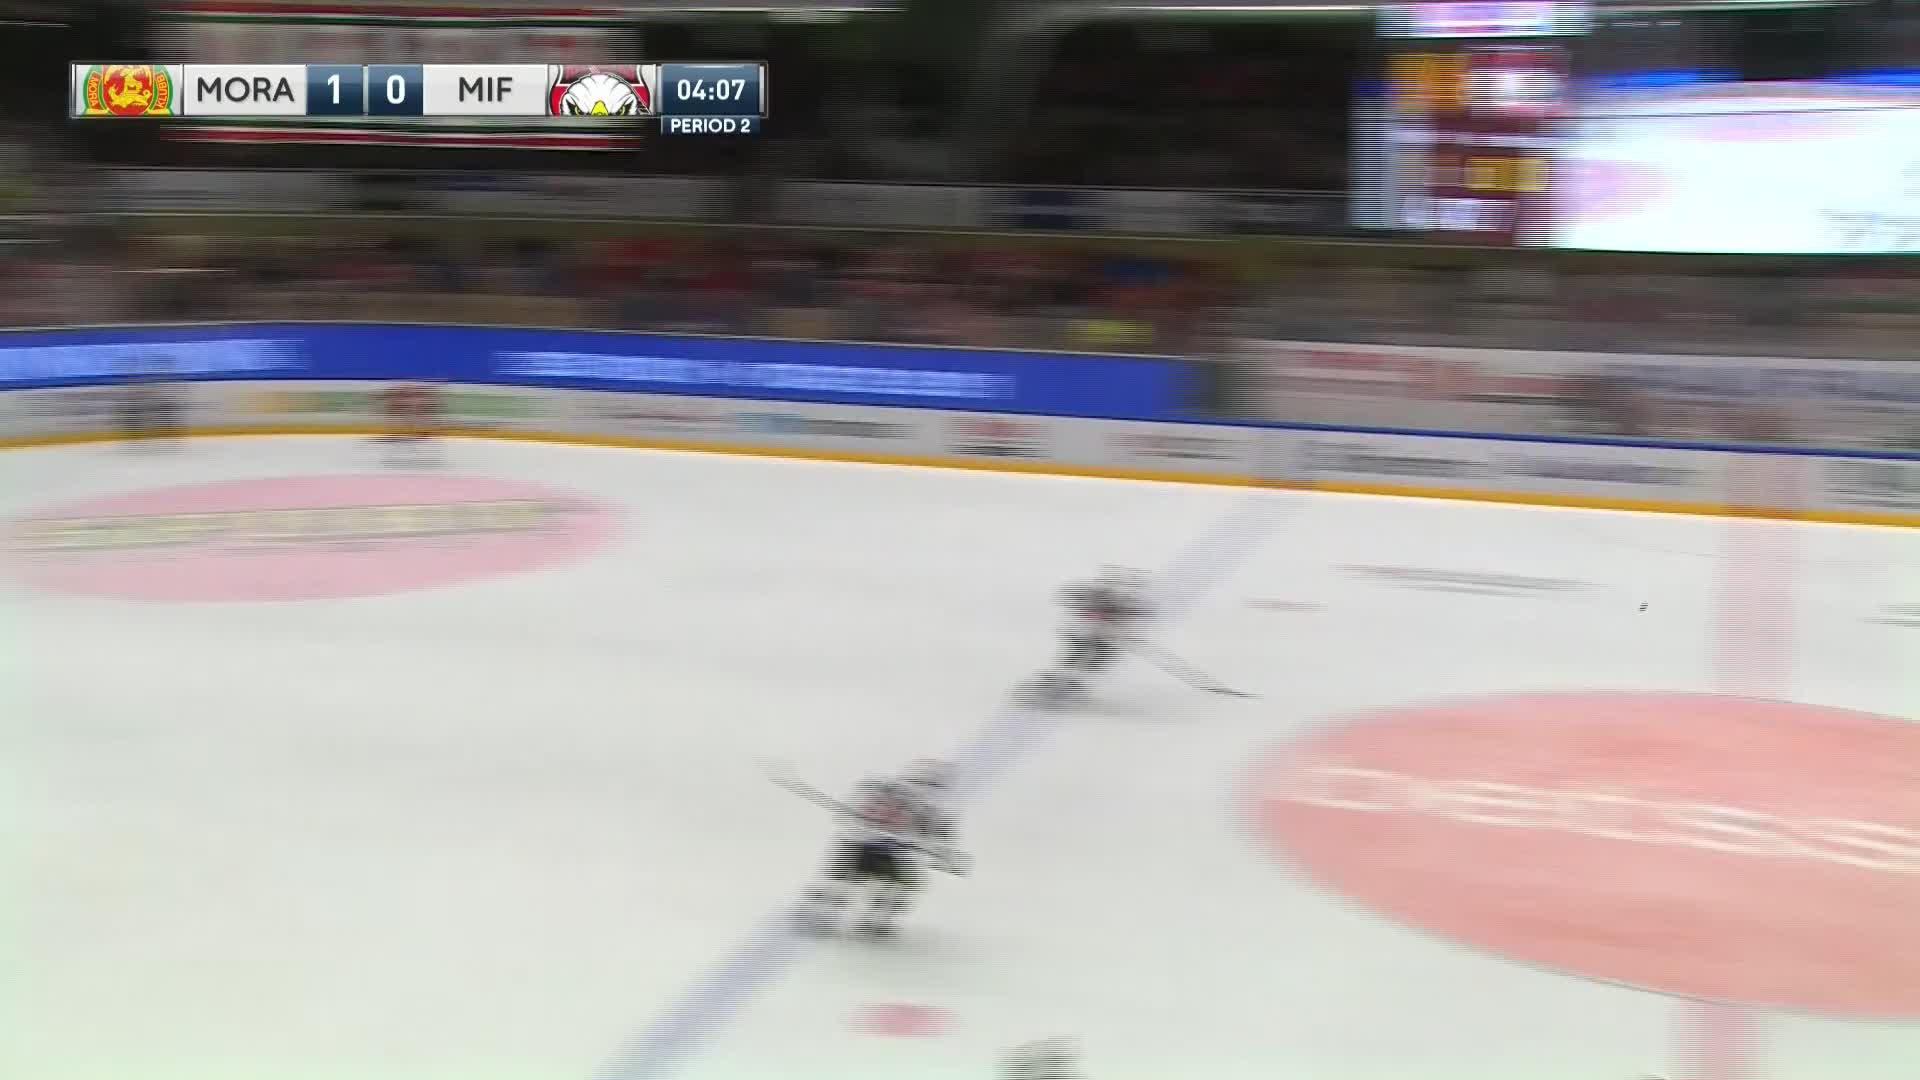 Mora IK - Malmö Redhawks 2-0